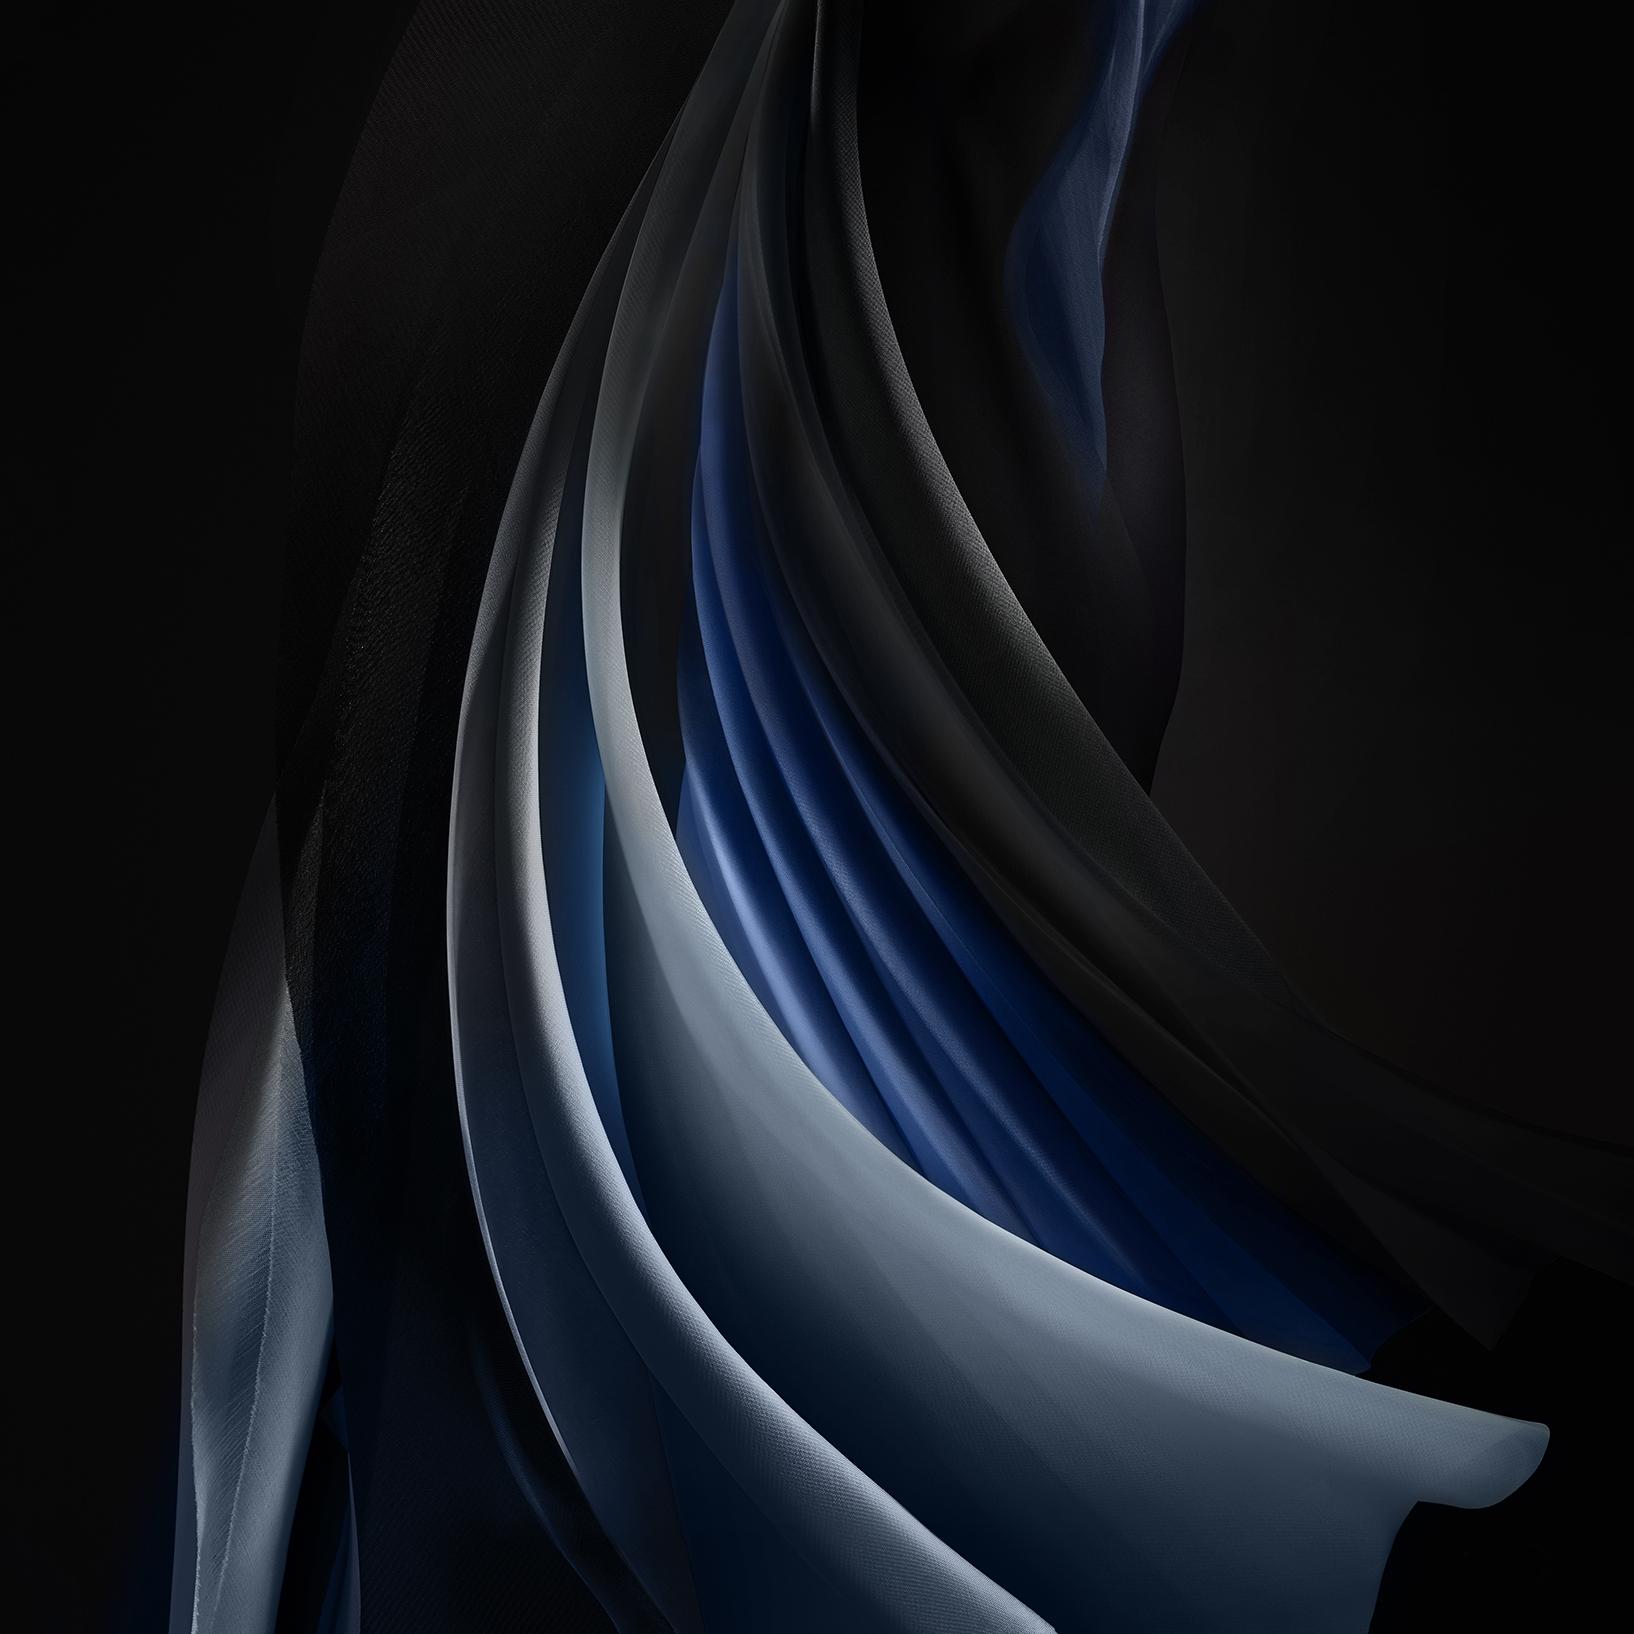 Silk_Space_Grey_Mono_Dark- iPhone SE 2020 - TechFoogle